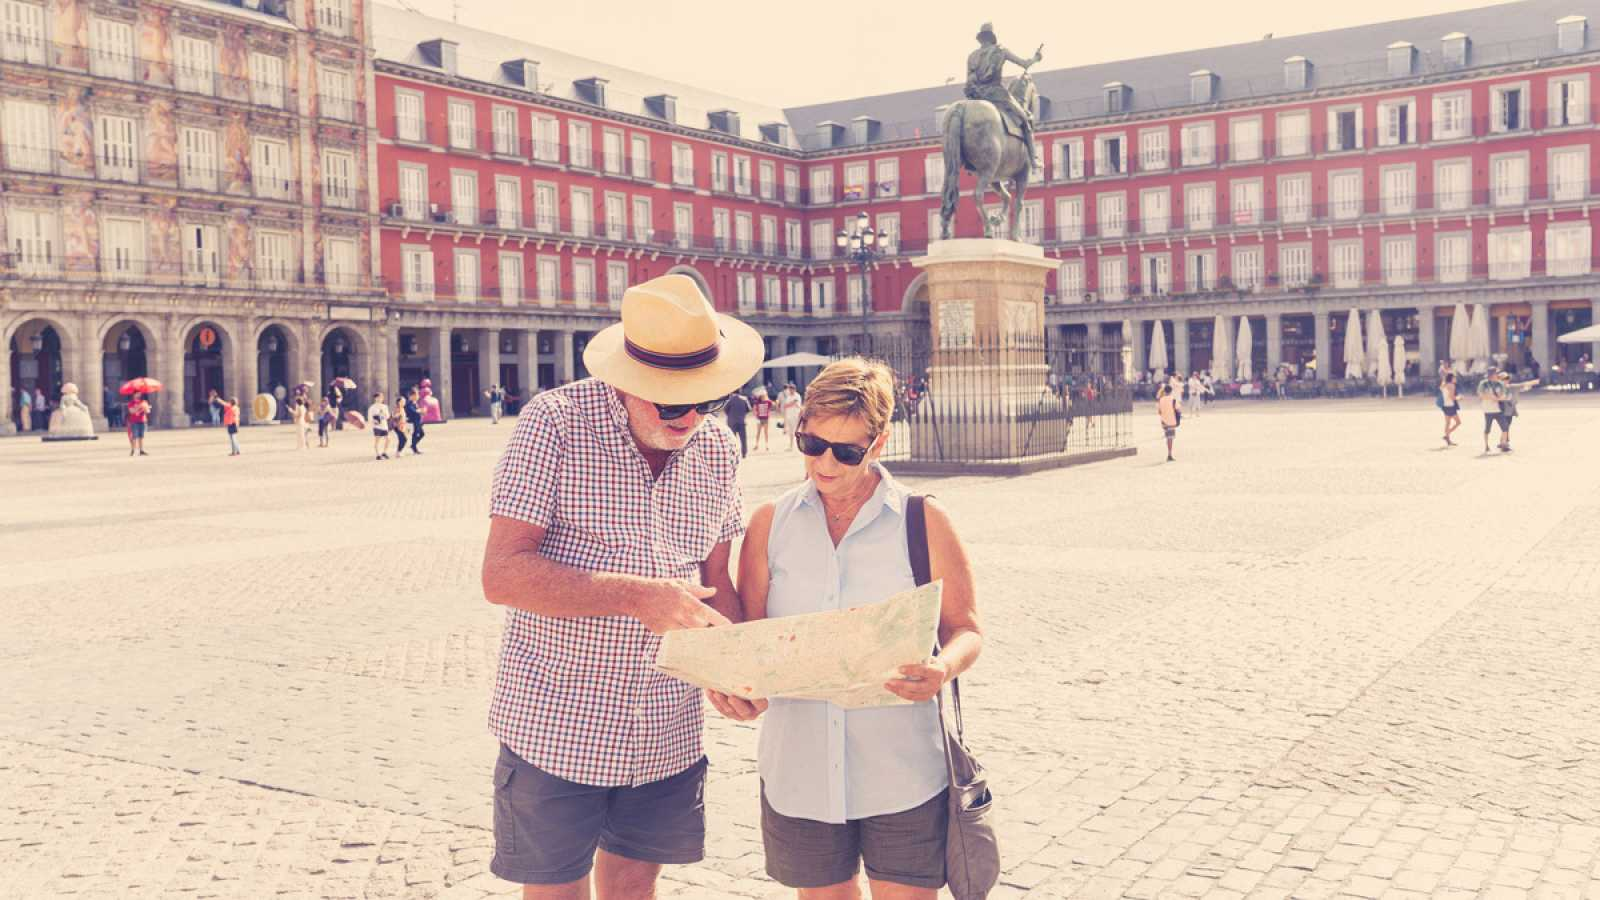 Plaza-Mayor-Madrid-Espan%CC%83a